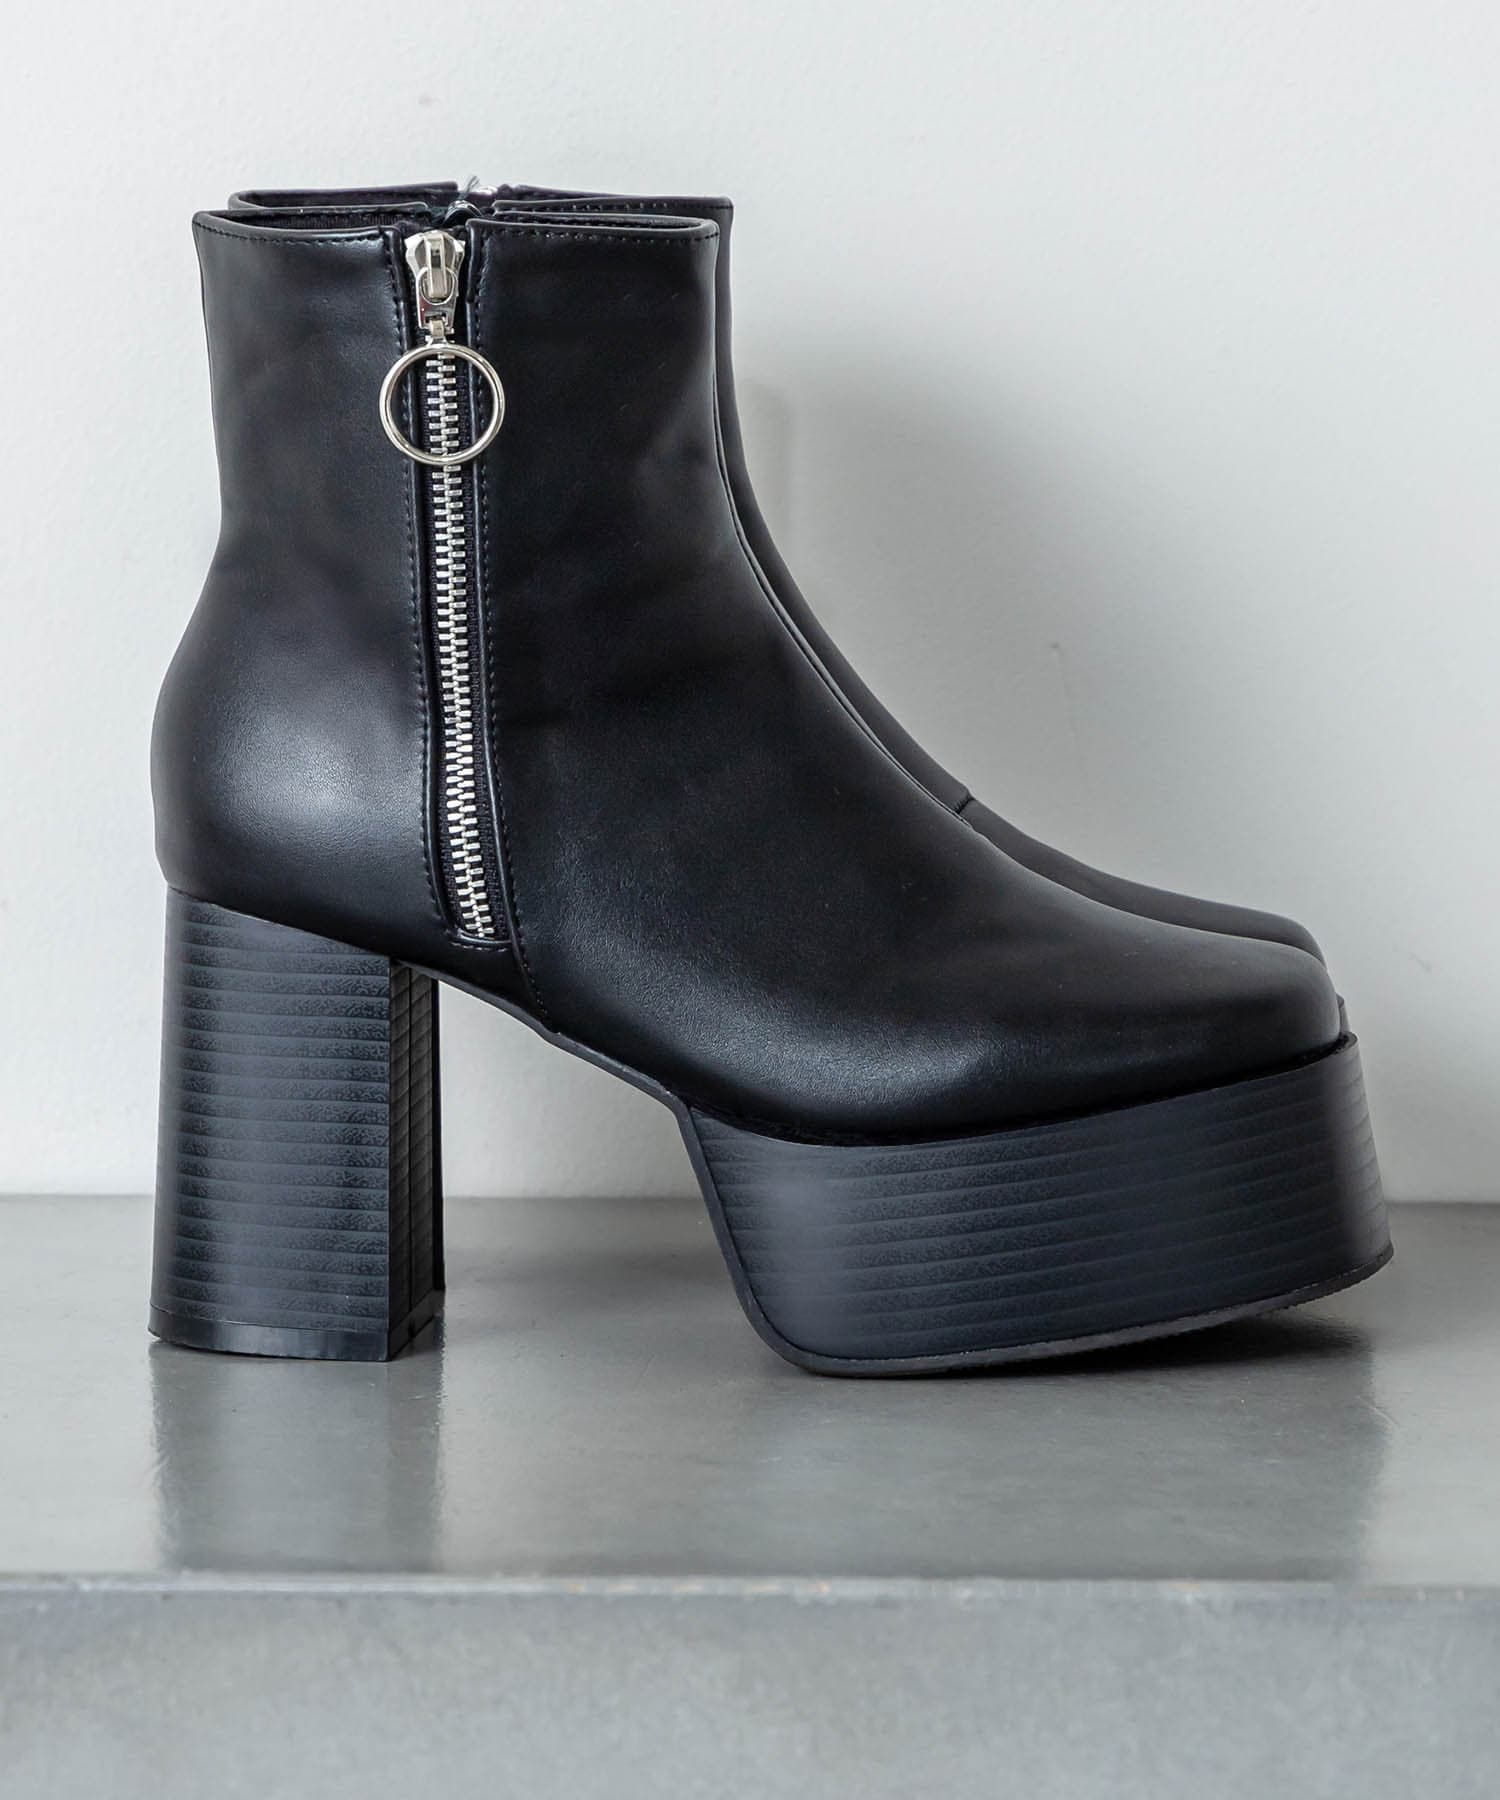 RASVOA(ラスボア) サイドジップ厚底ブーツ